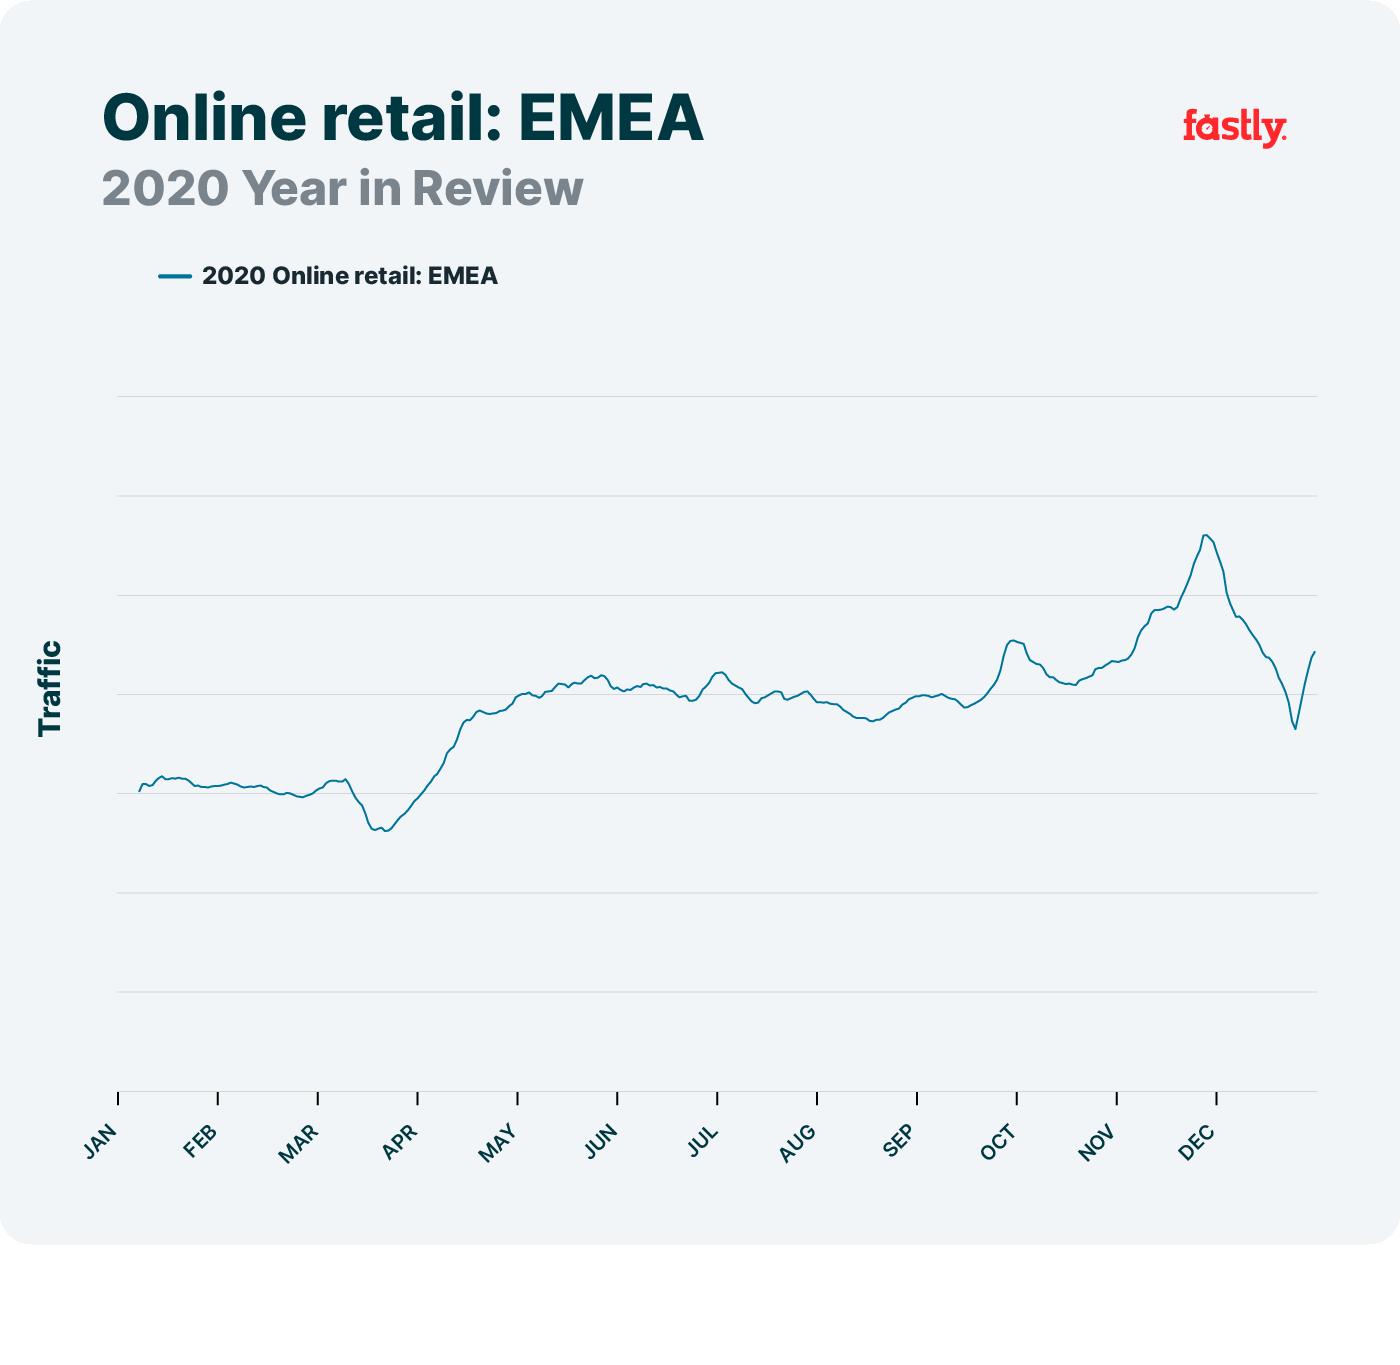 Online retail, EMEA, network trends 2020